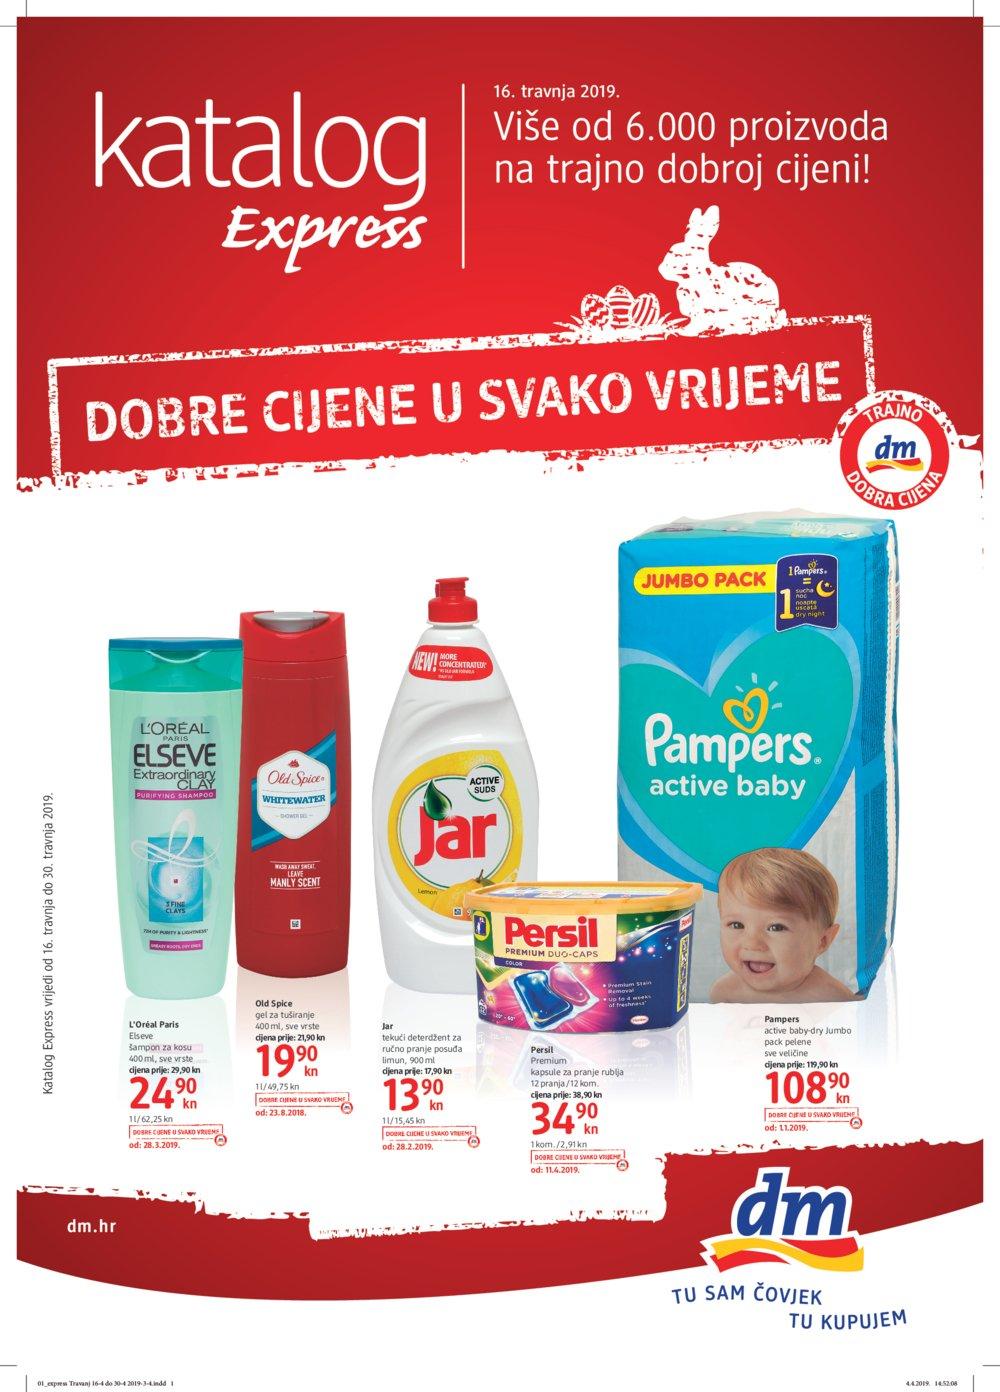 Dm katalog Express travanj 16.04.-30.04.2019.